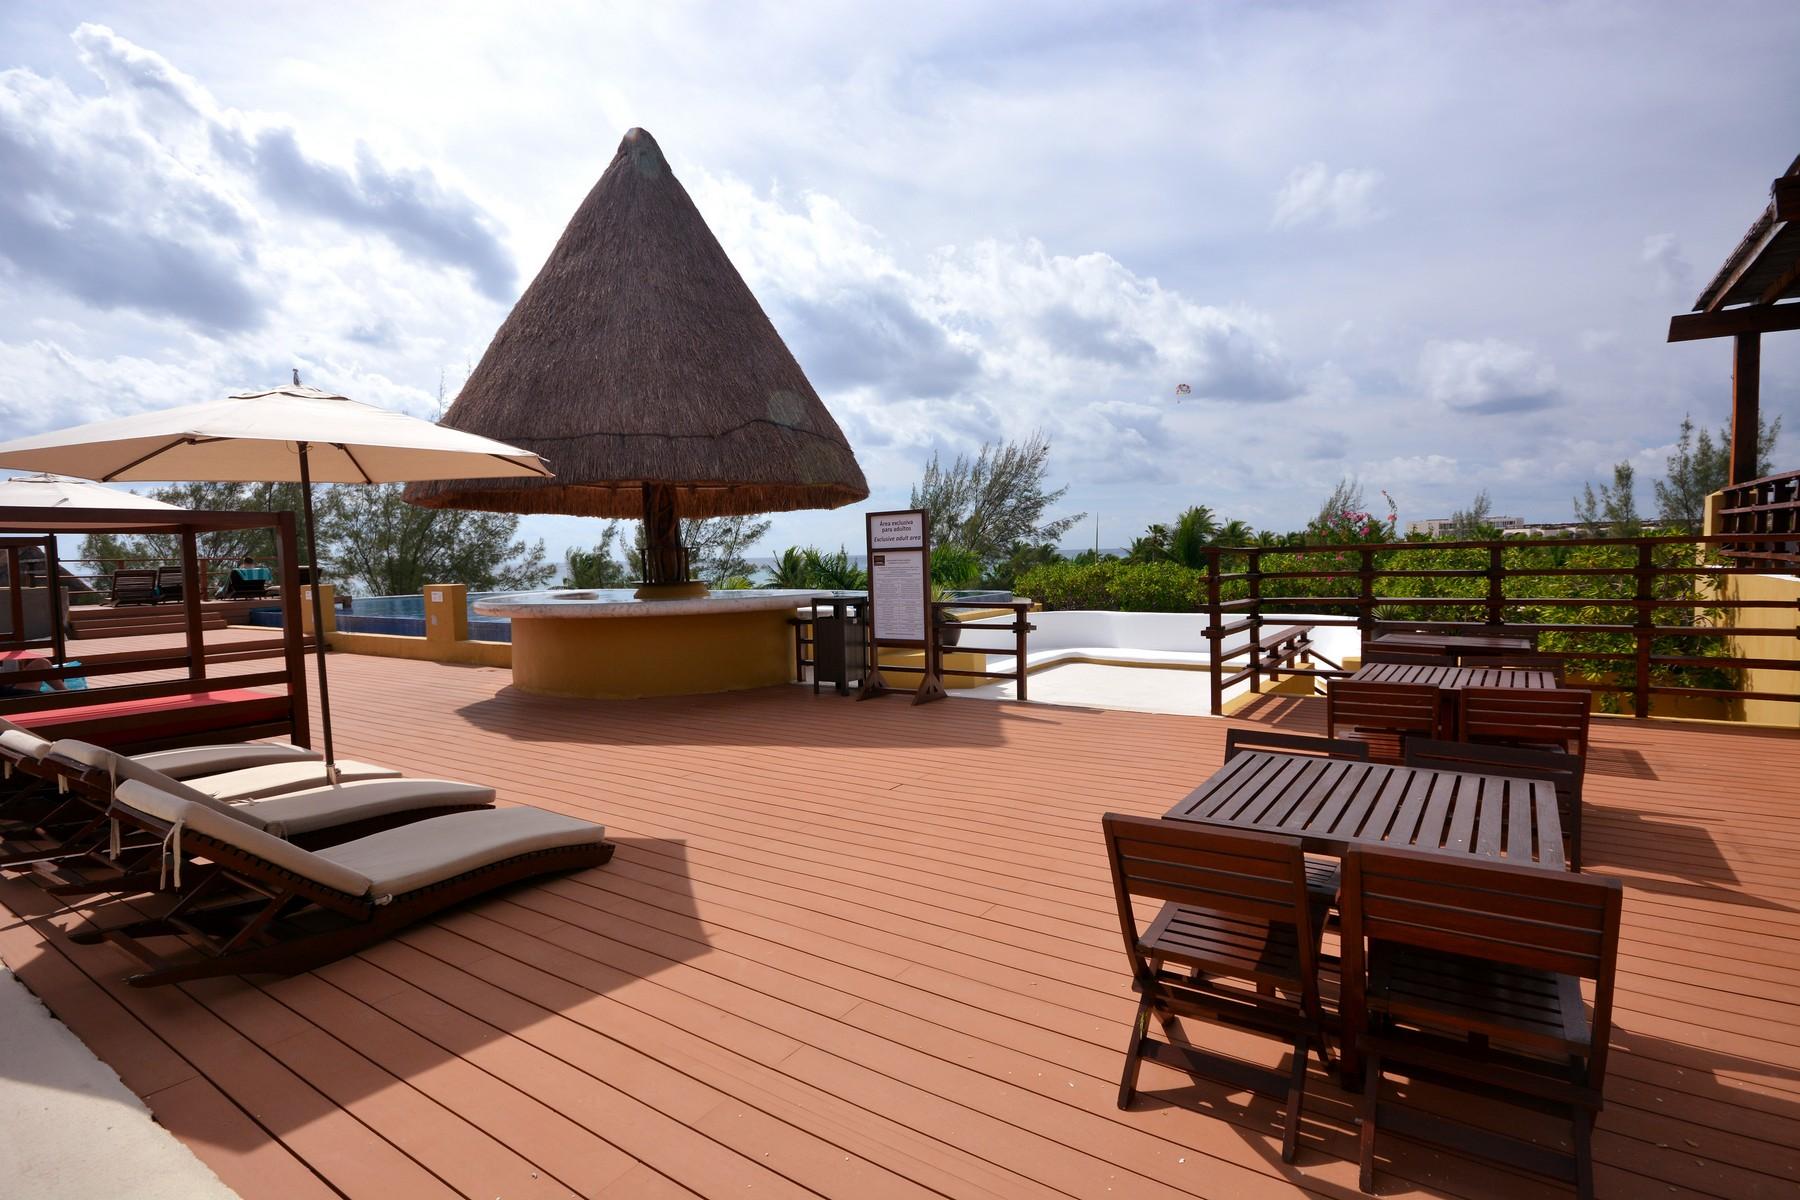 Additional photo for property listing at PUEBLITO PARAISO ESCONDIDO Hidden Paradise Pueblito Av. 38 norte, entre Flamingos y Albatros Playa Del Carmen, Quintana Roo 77728 México